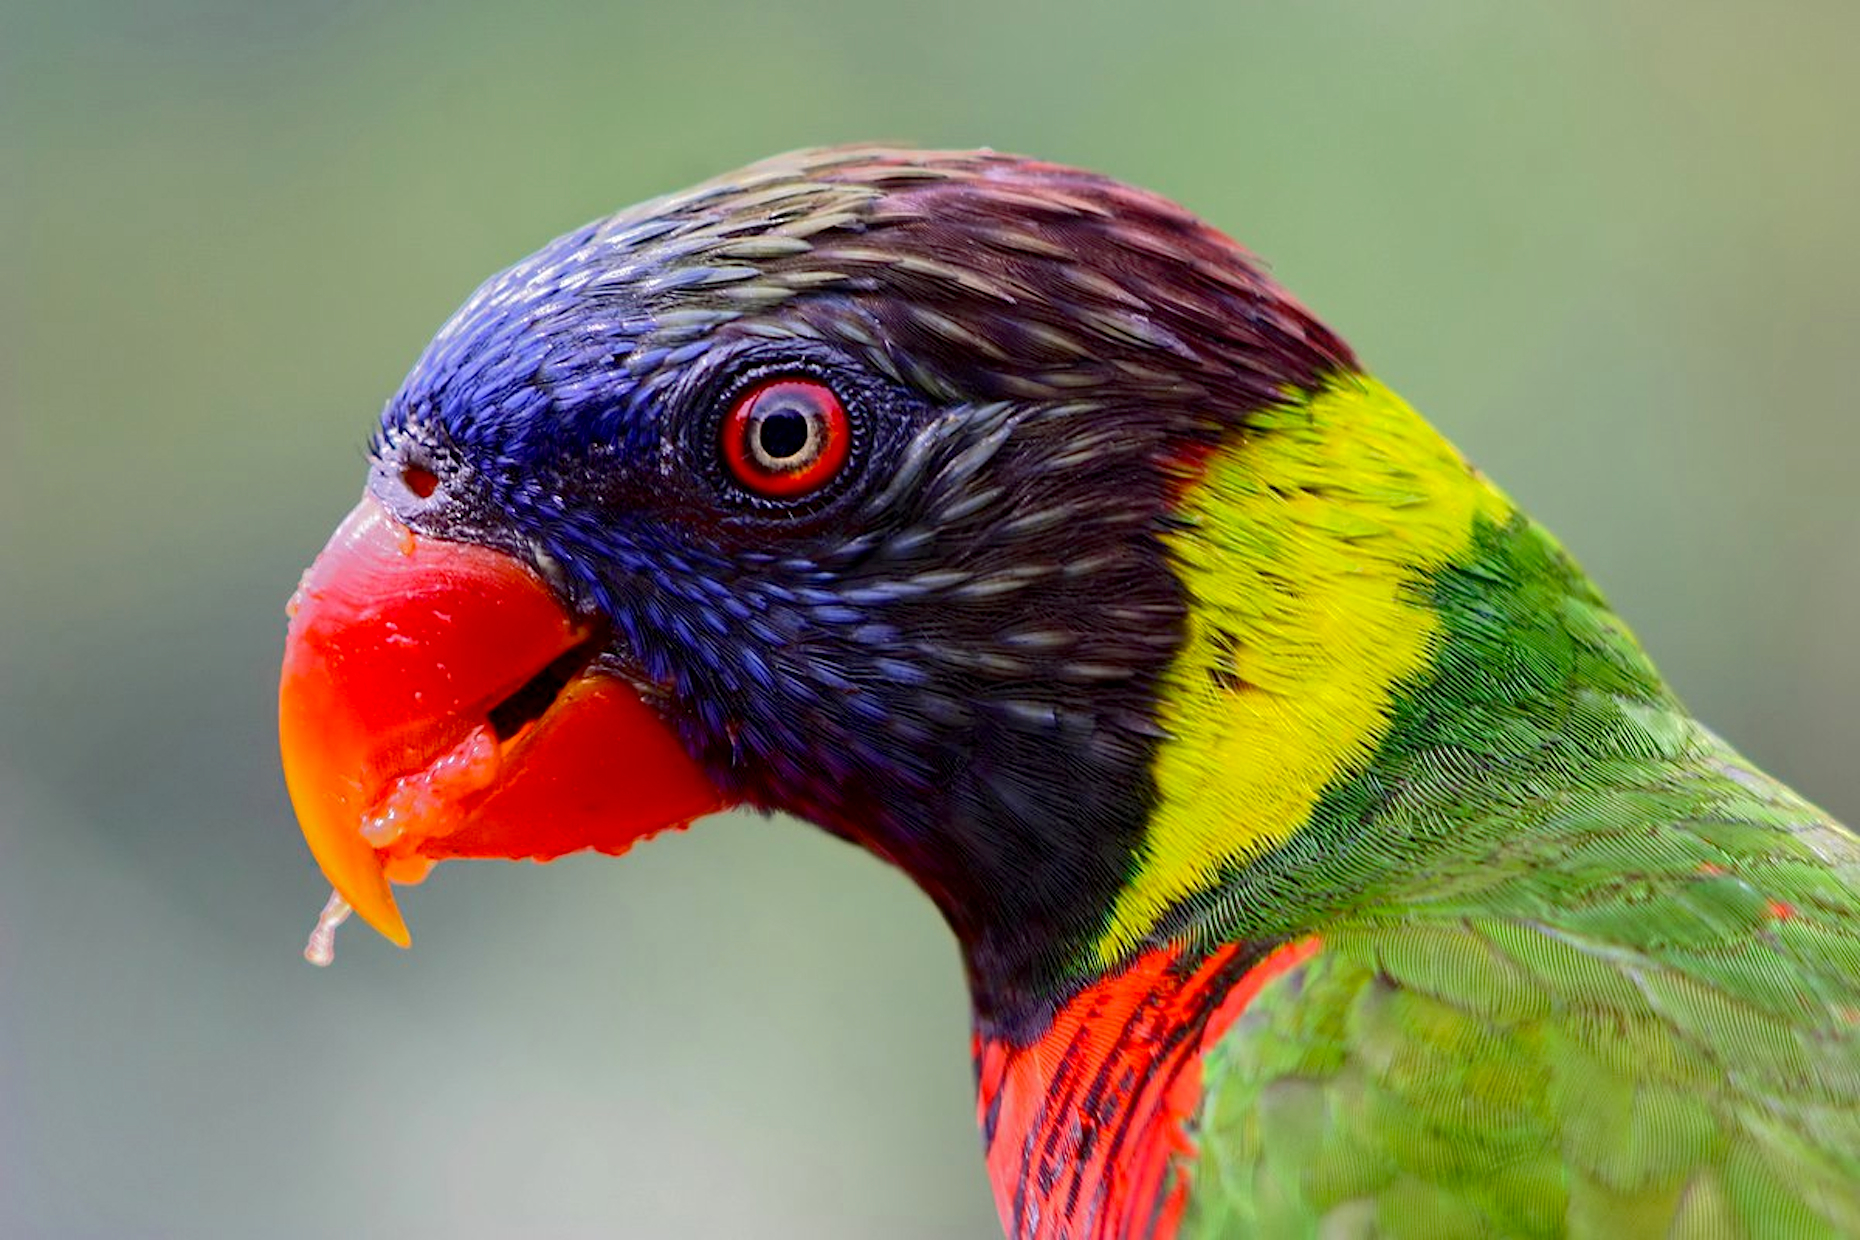 Peter-Pischler-Rainbow-Lorikeet-Java-Indonesia